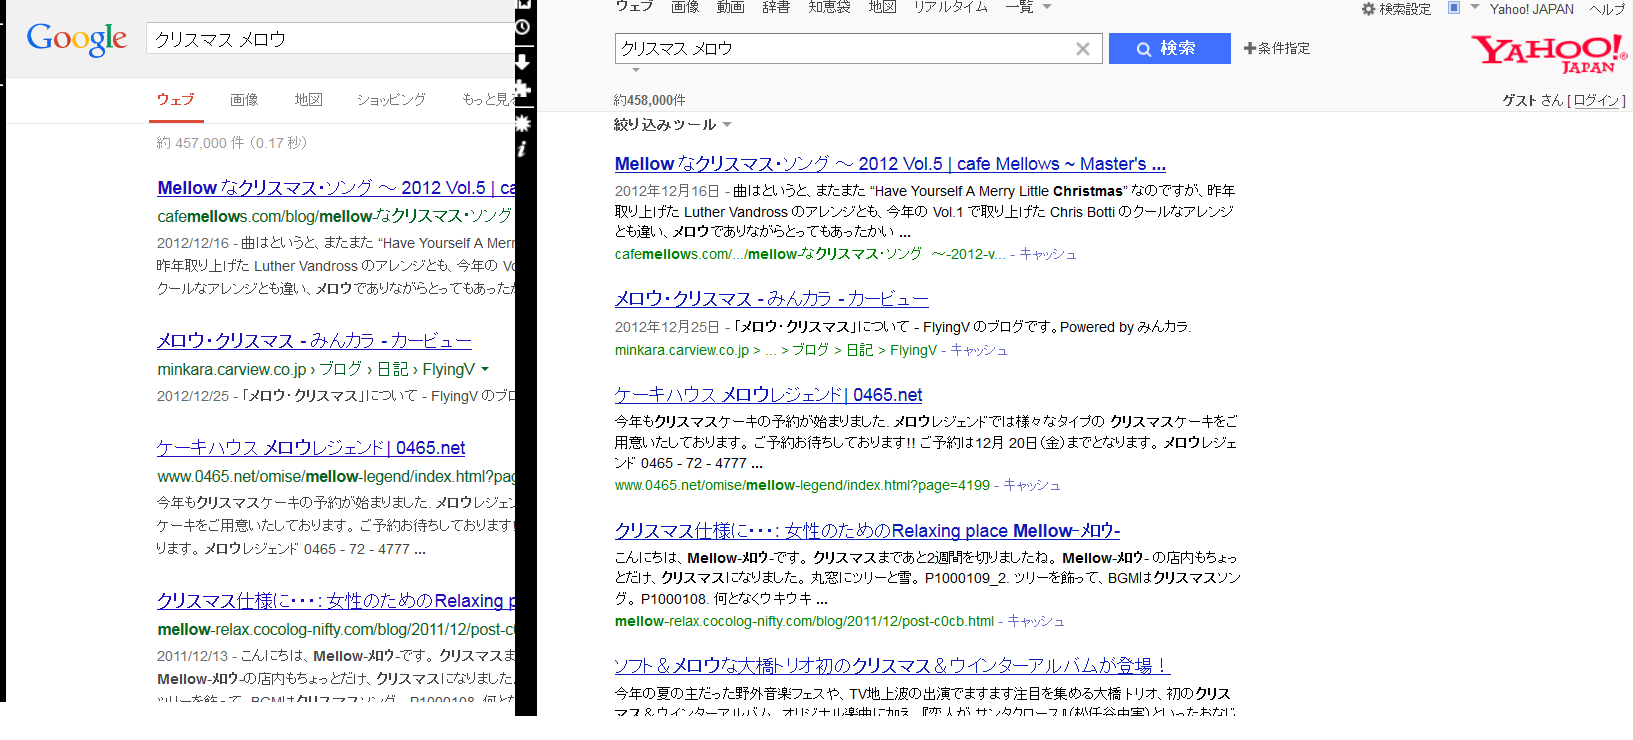 Google & Yahoo search